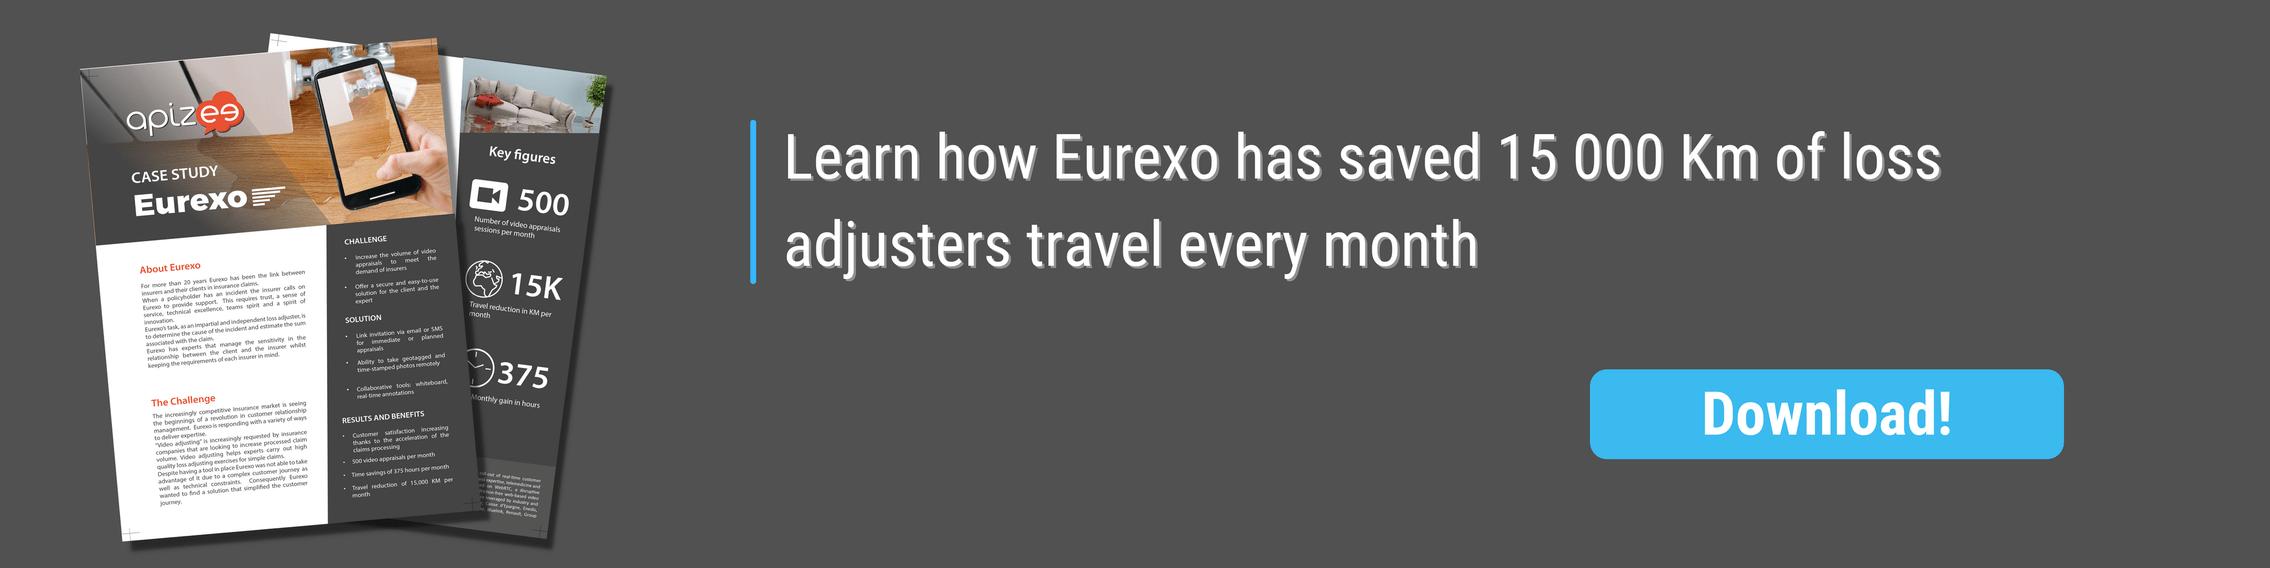 Banner case study Eurexo